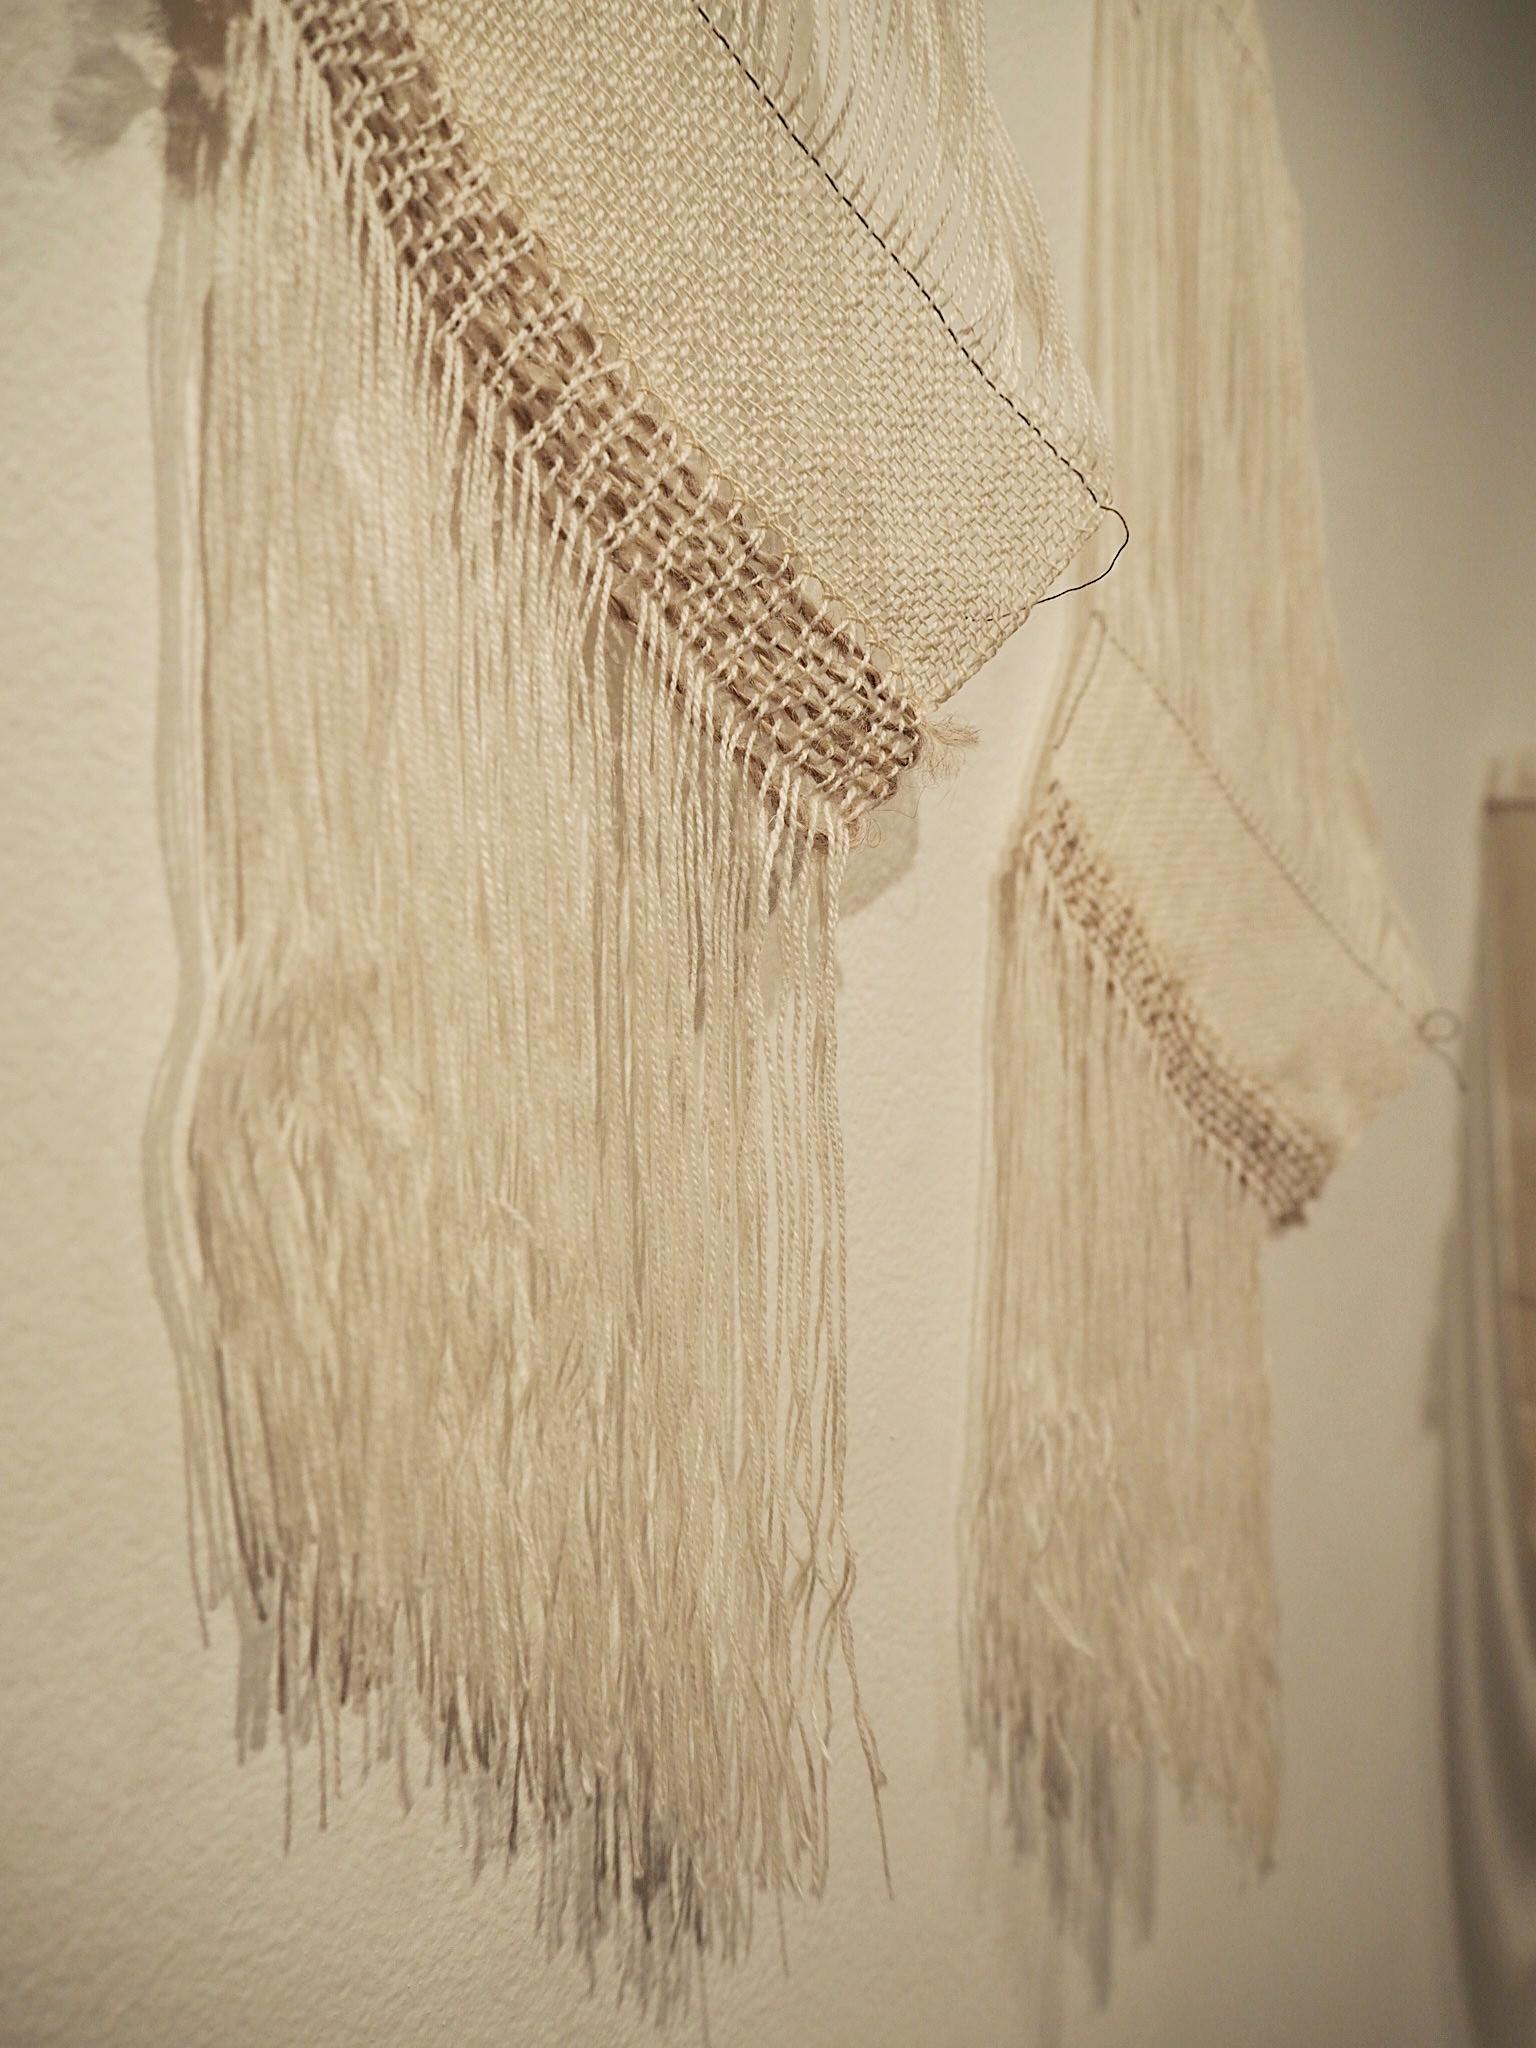 Hum (detail), 2016, Korina Leoncio